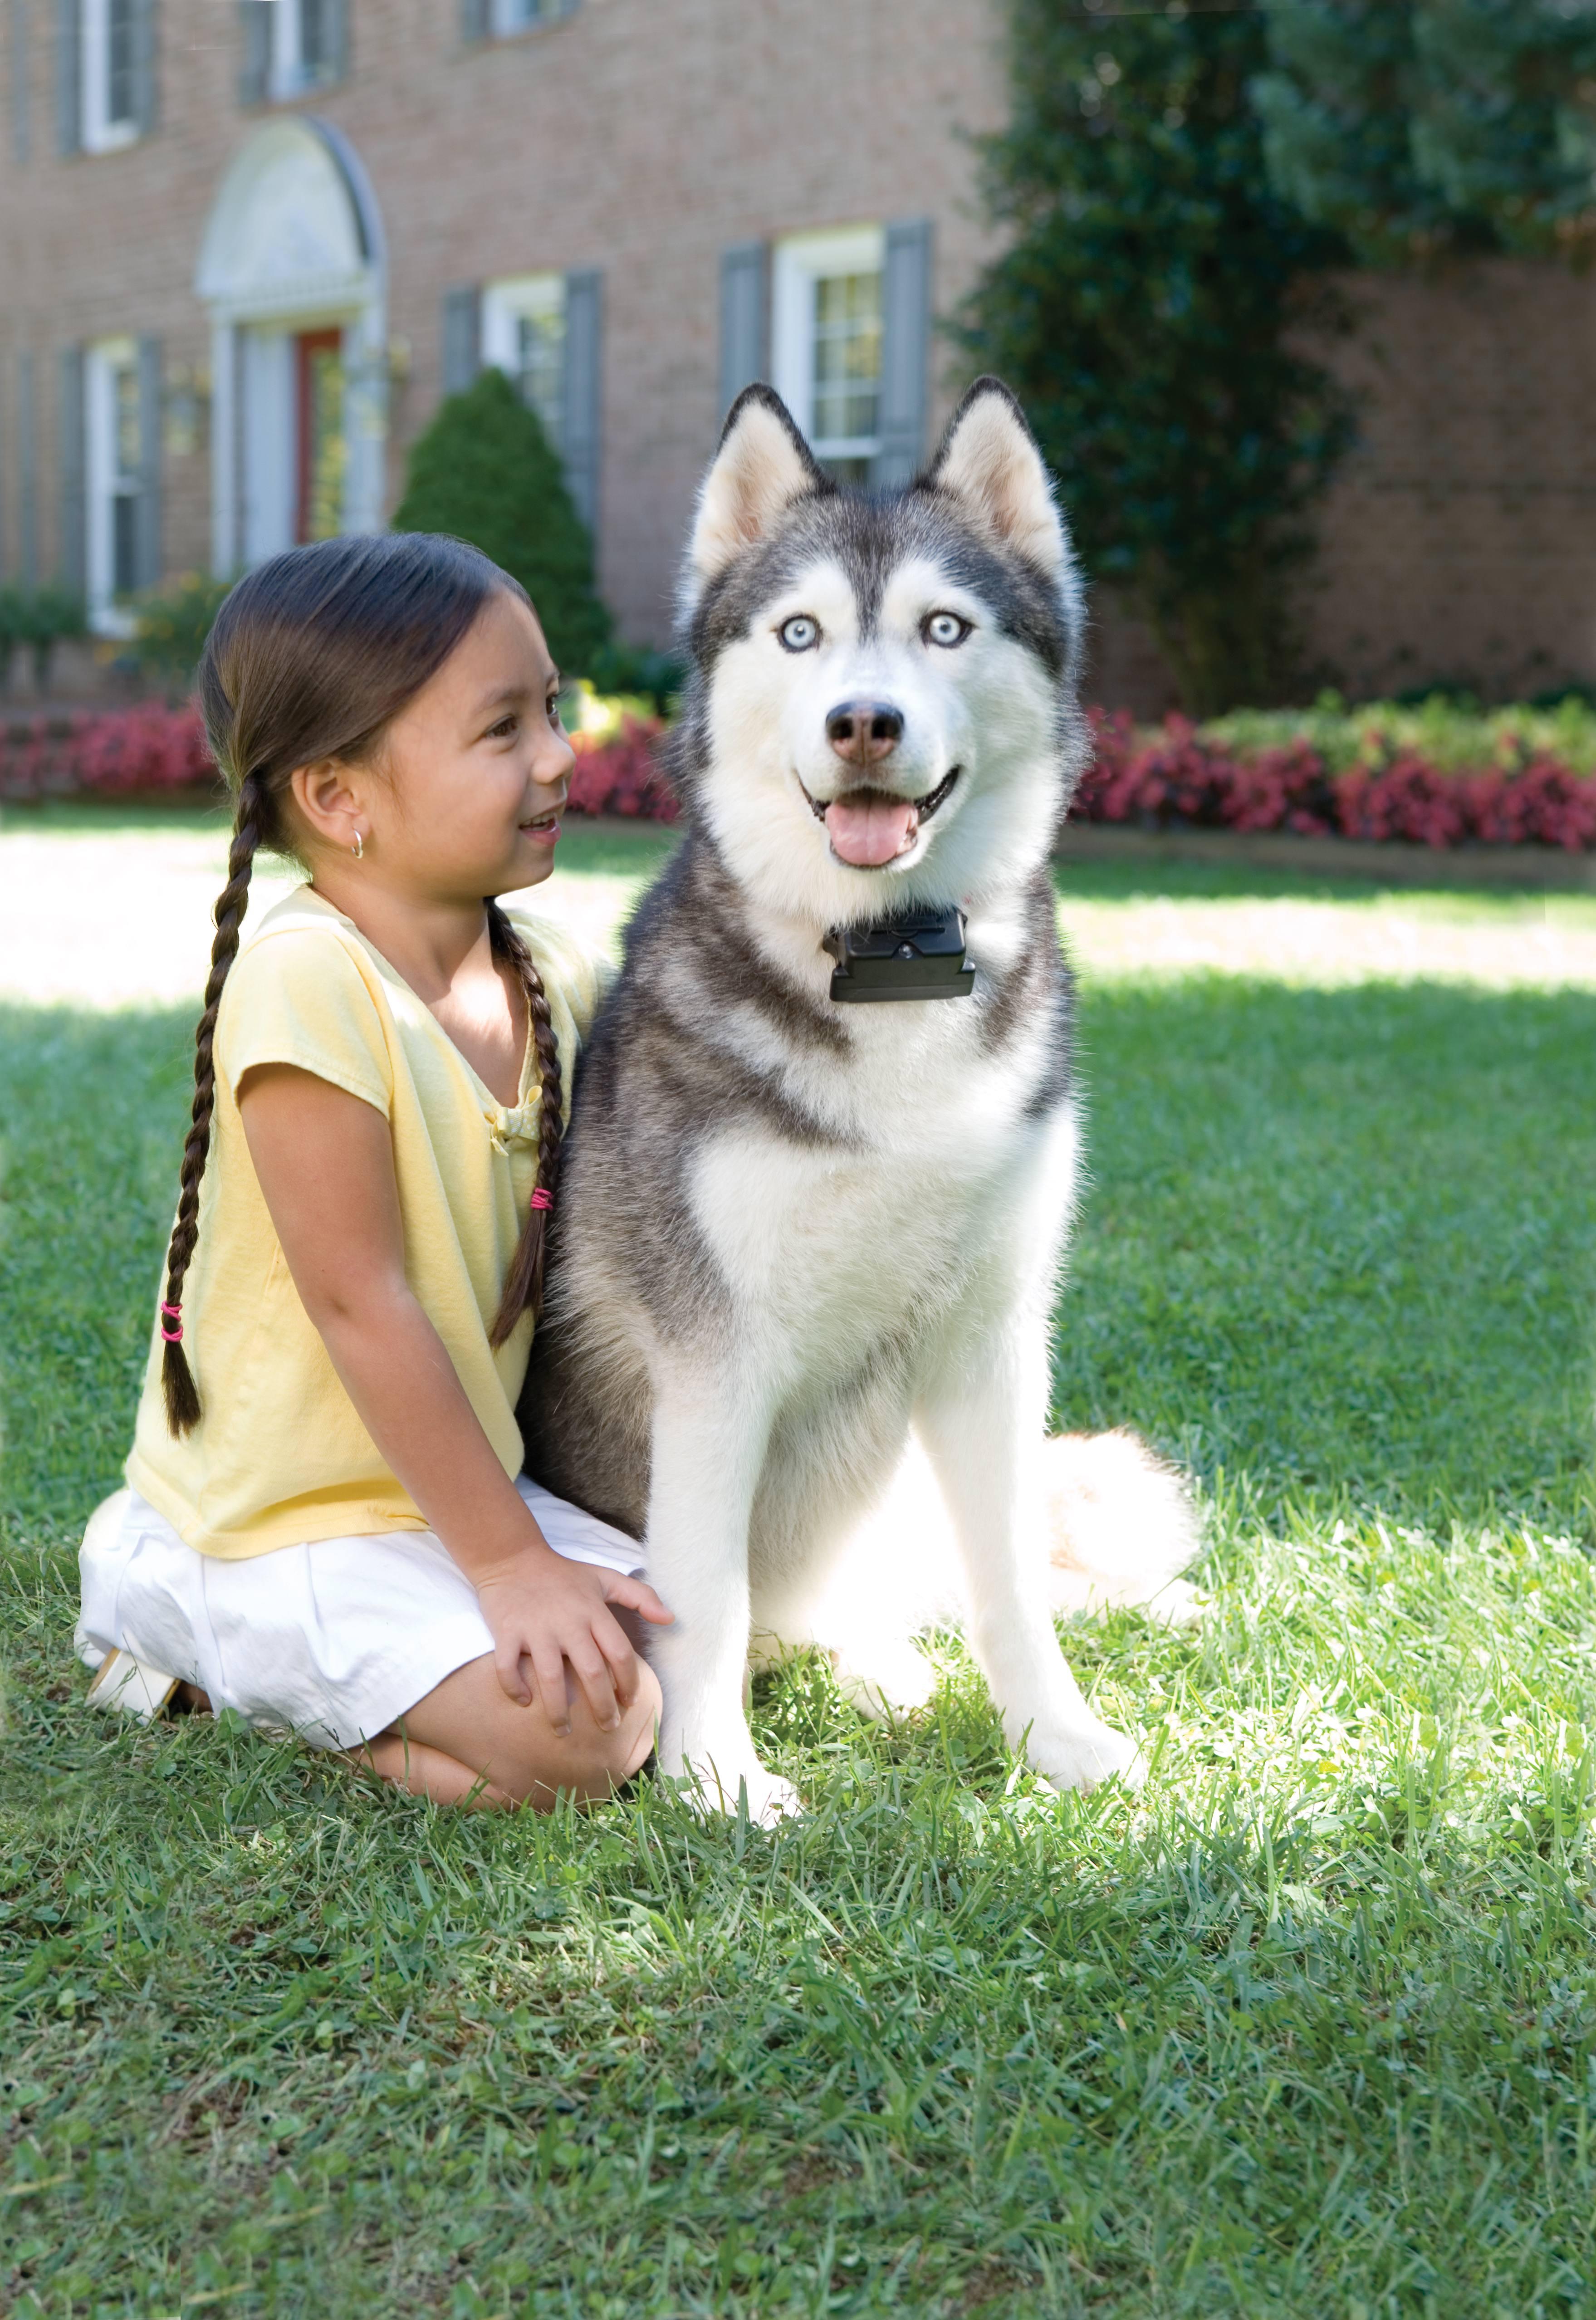 Berühmt Unsichtbarer Hundezaun Radio Fence Super von PetSafe &JX_83